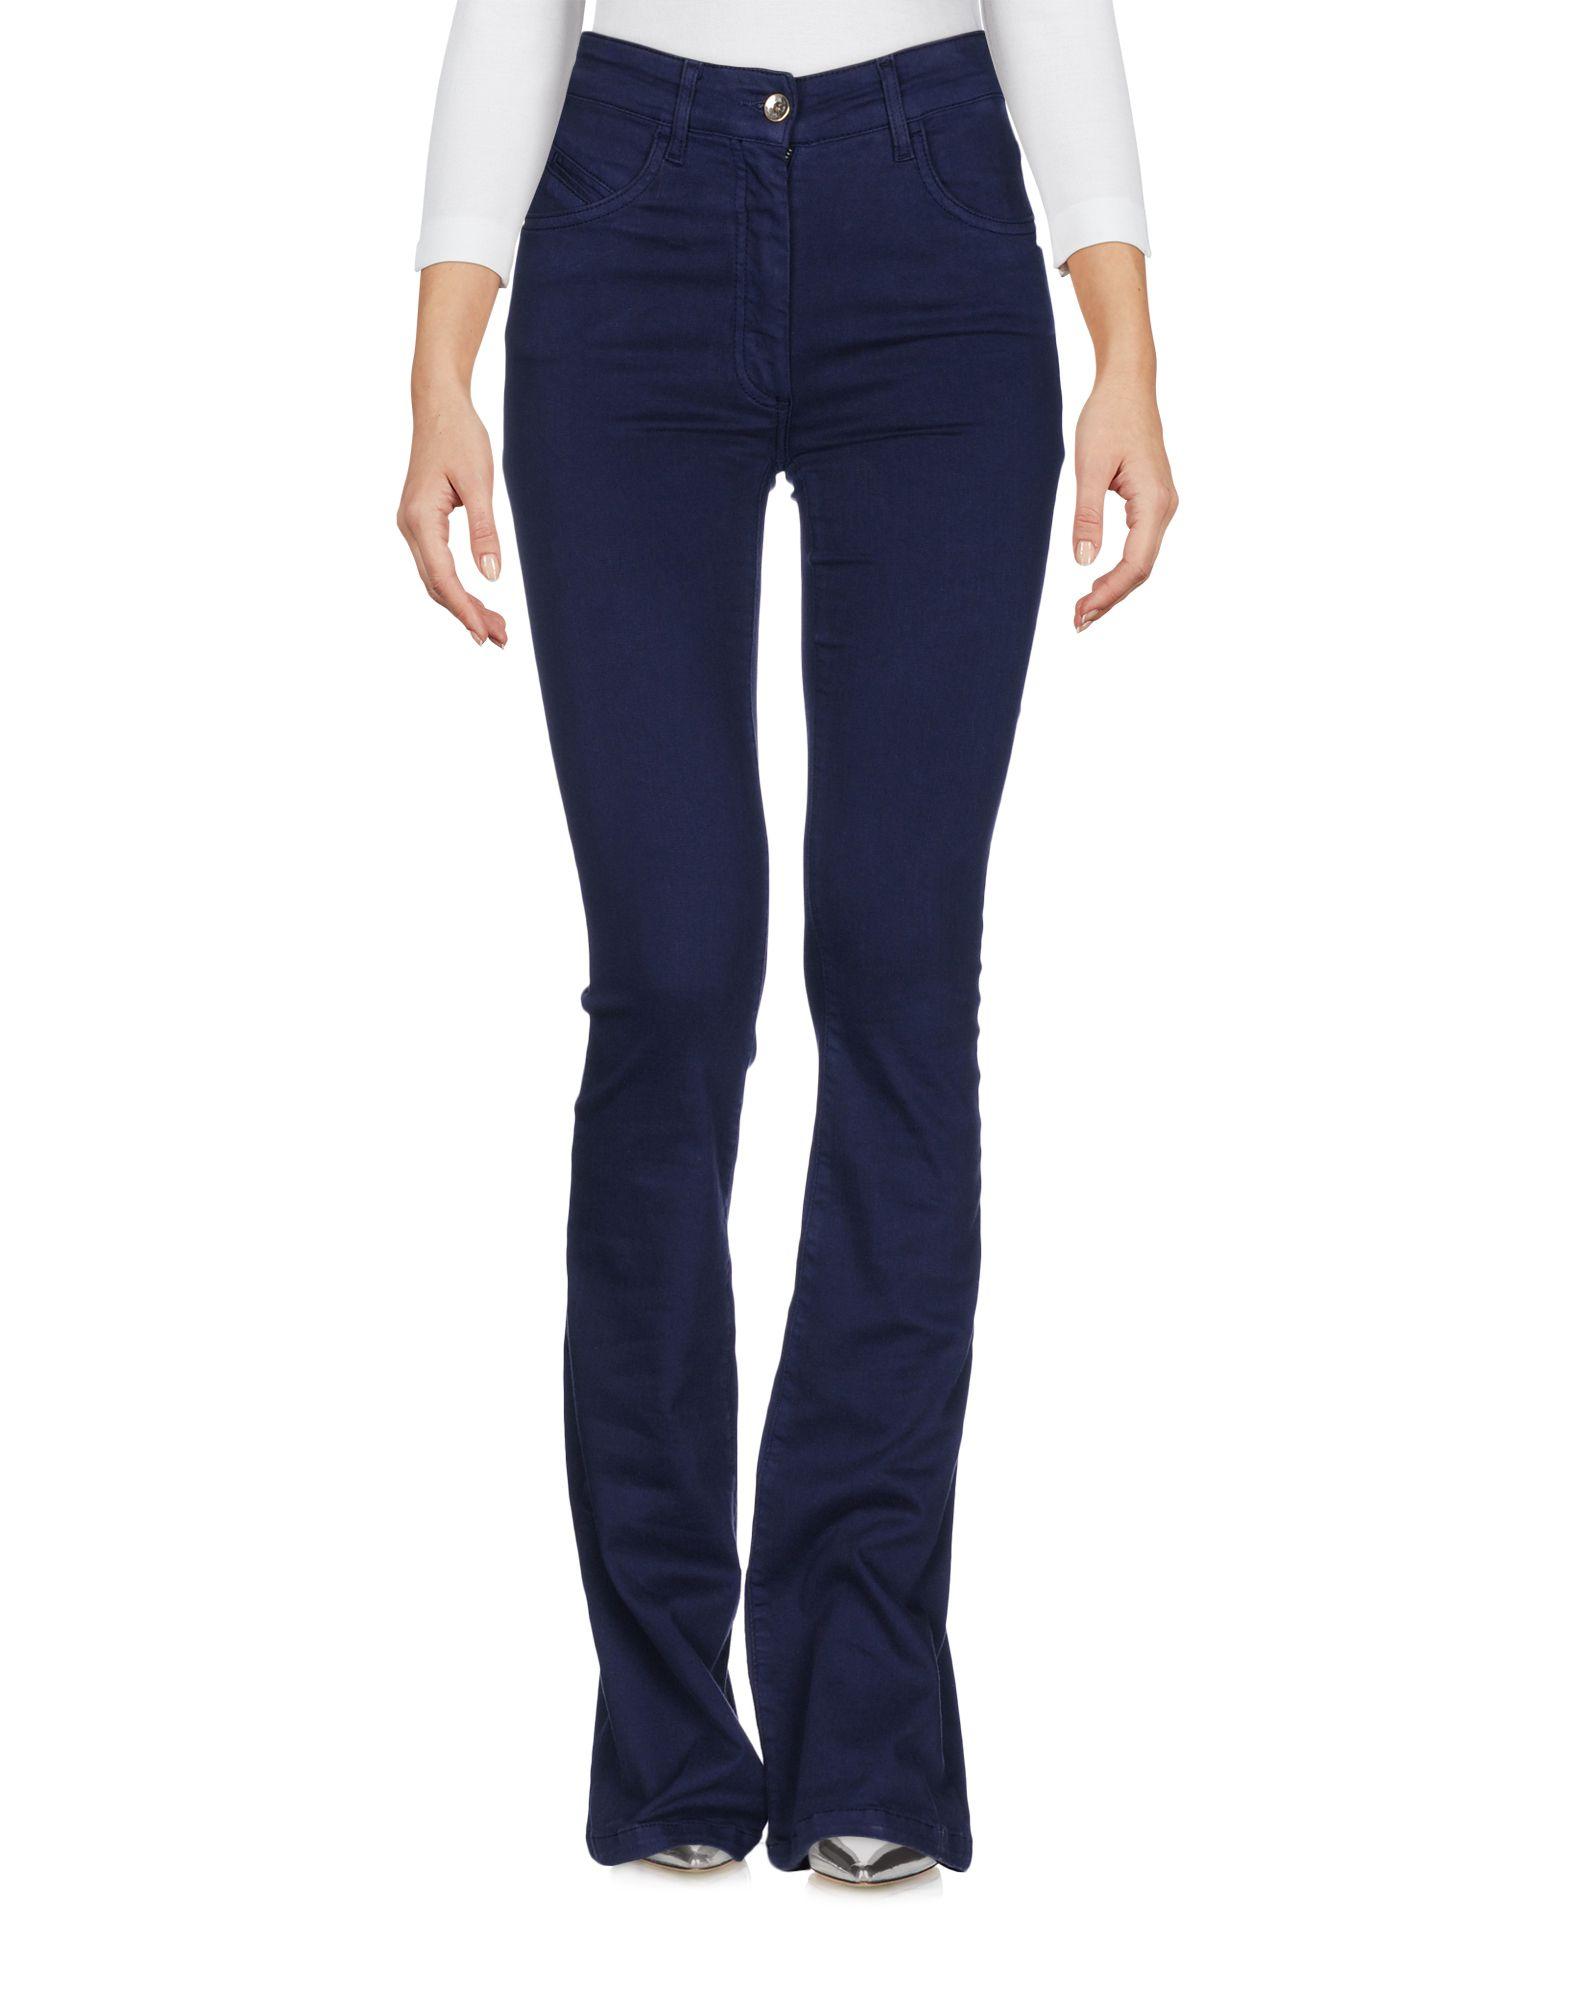 PATRIZIA PEPE Damen Jeanshose Farbe Dunkelblau Größe 3